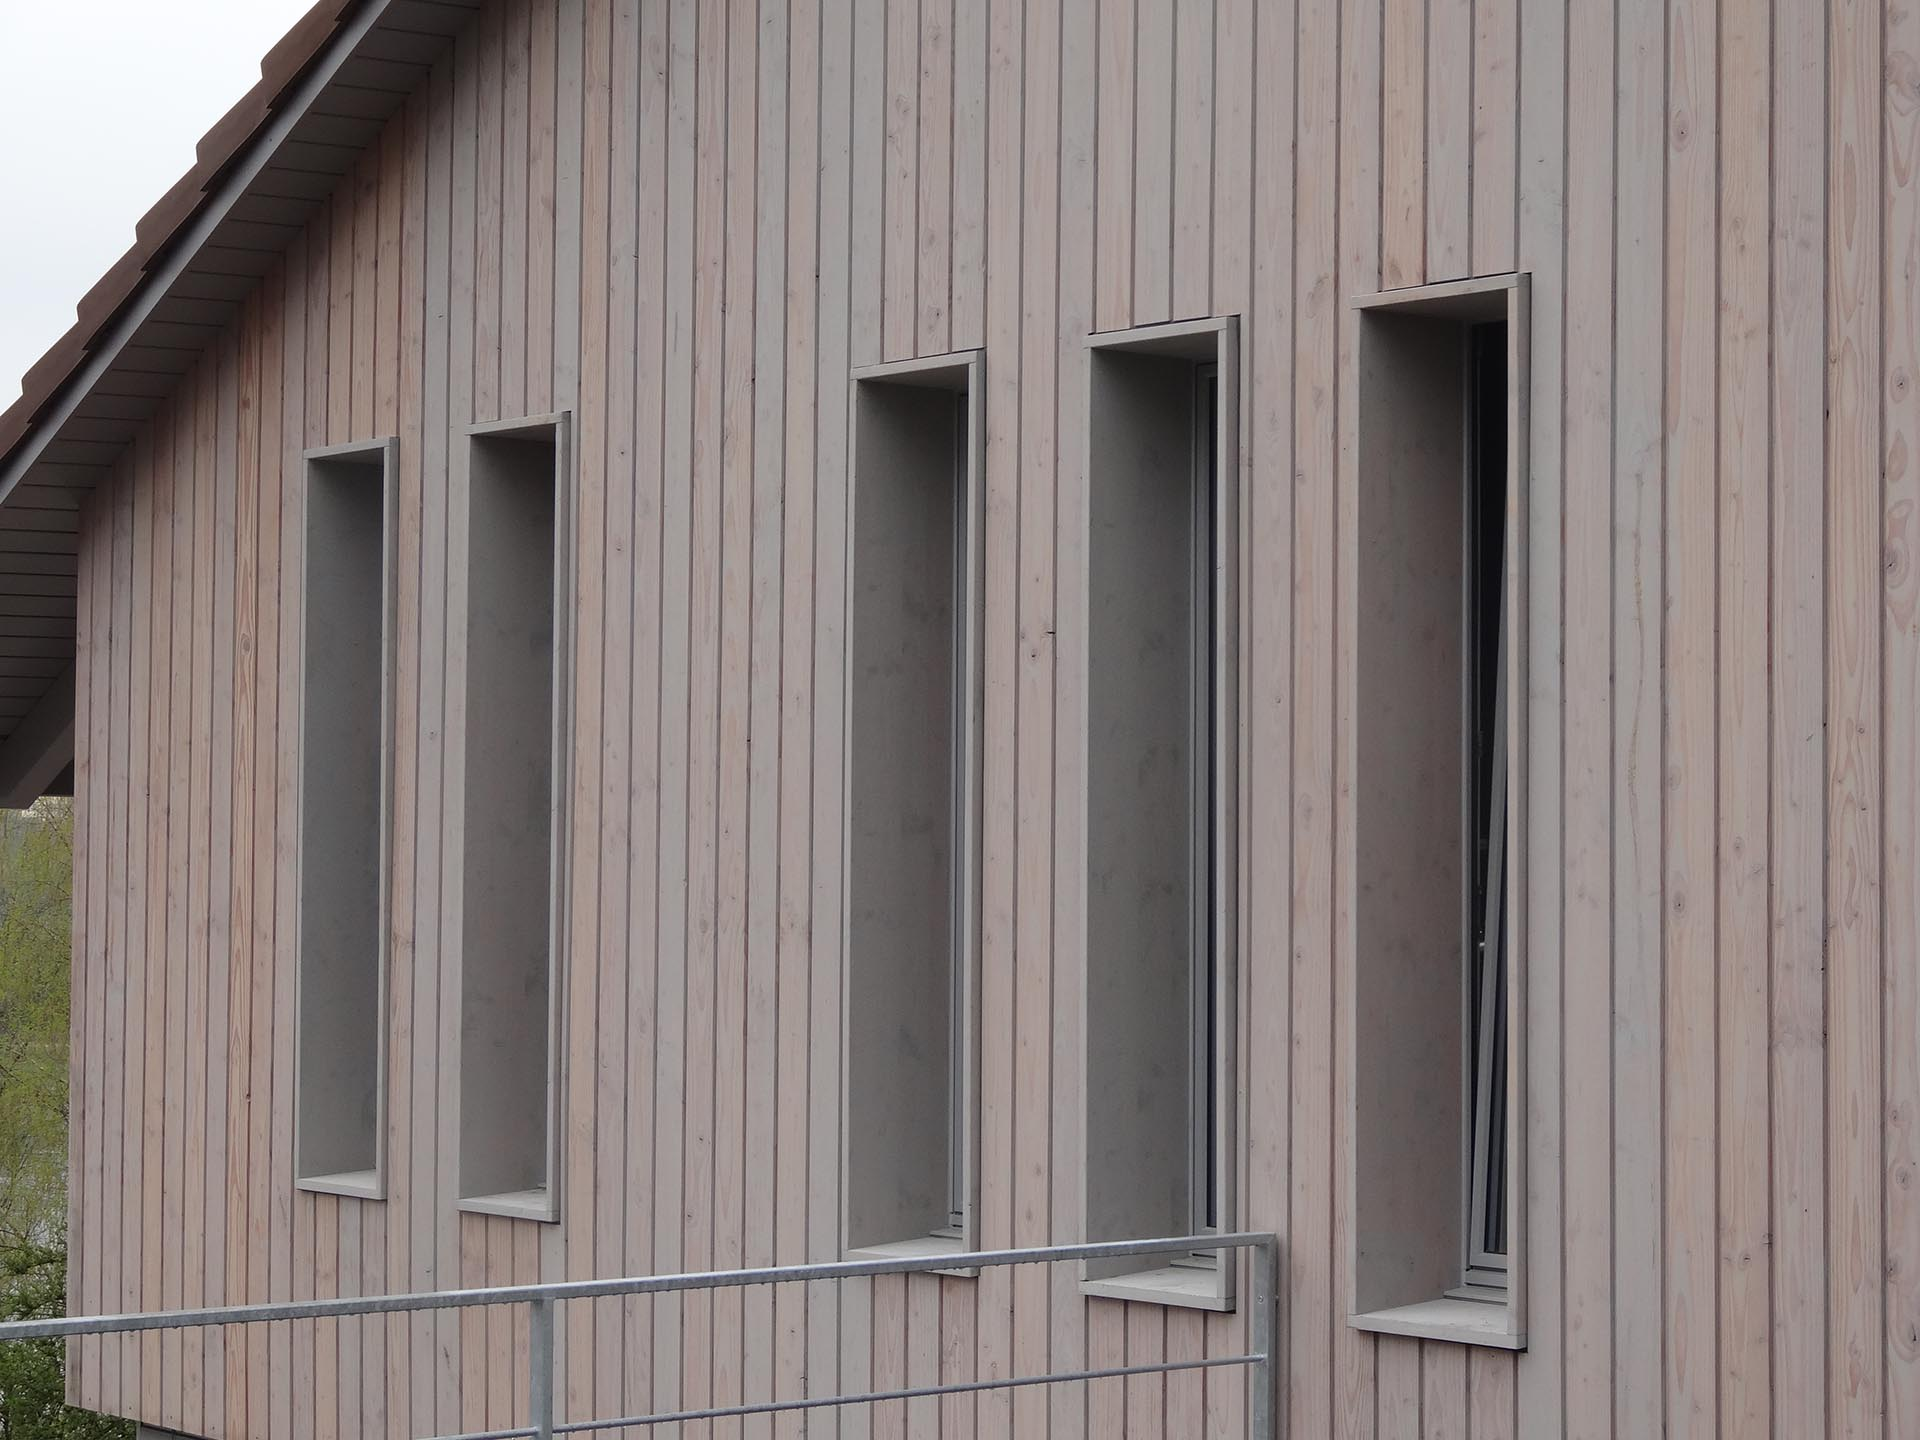 Fassadenverkleidungen-in-Holz